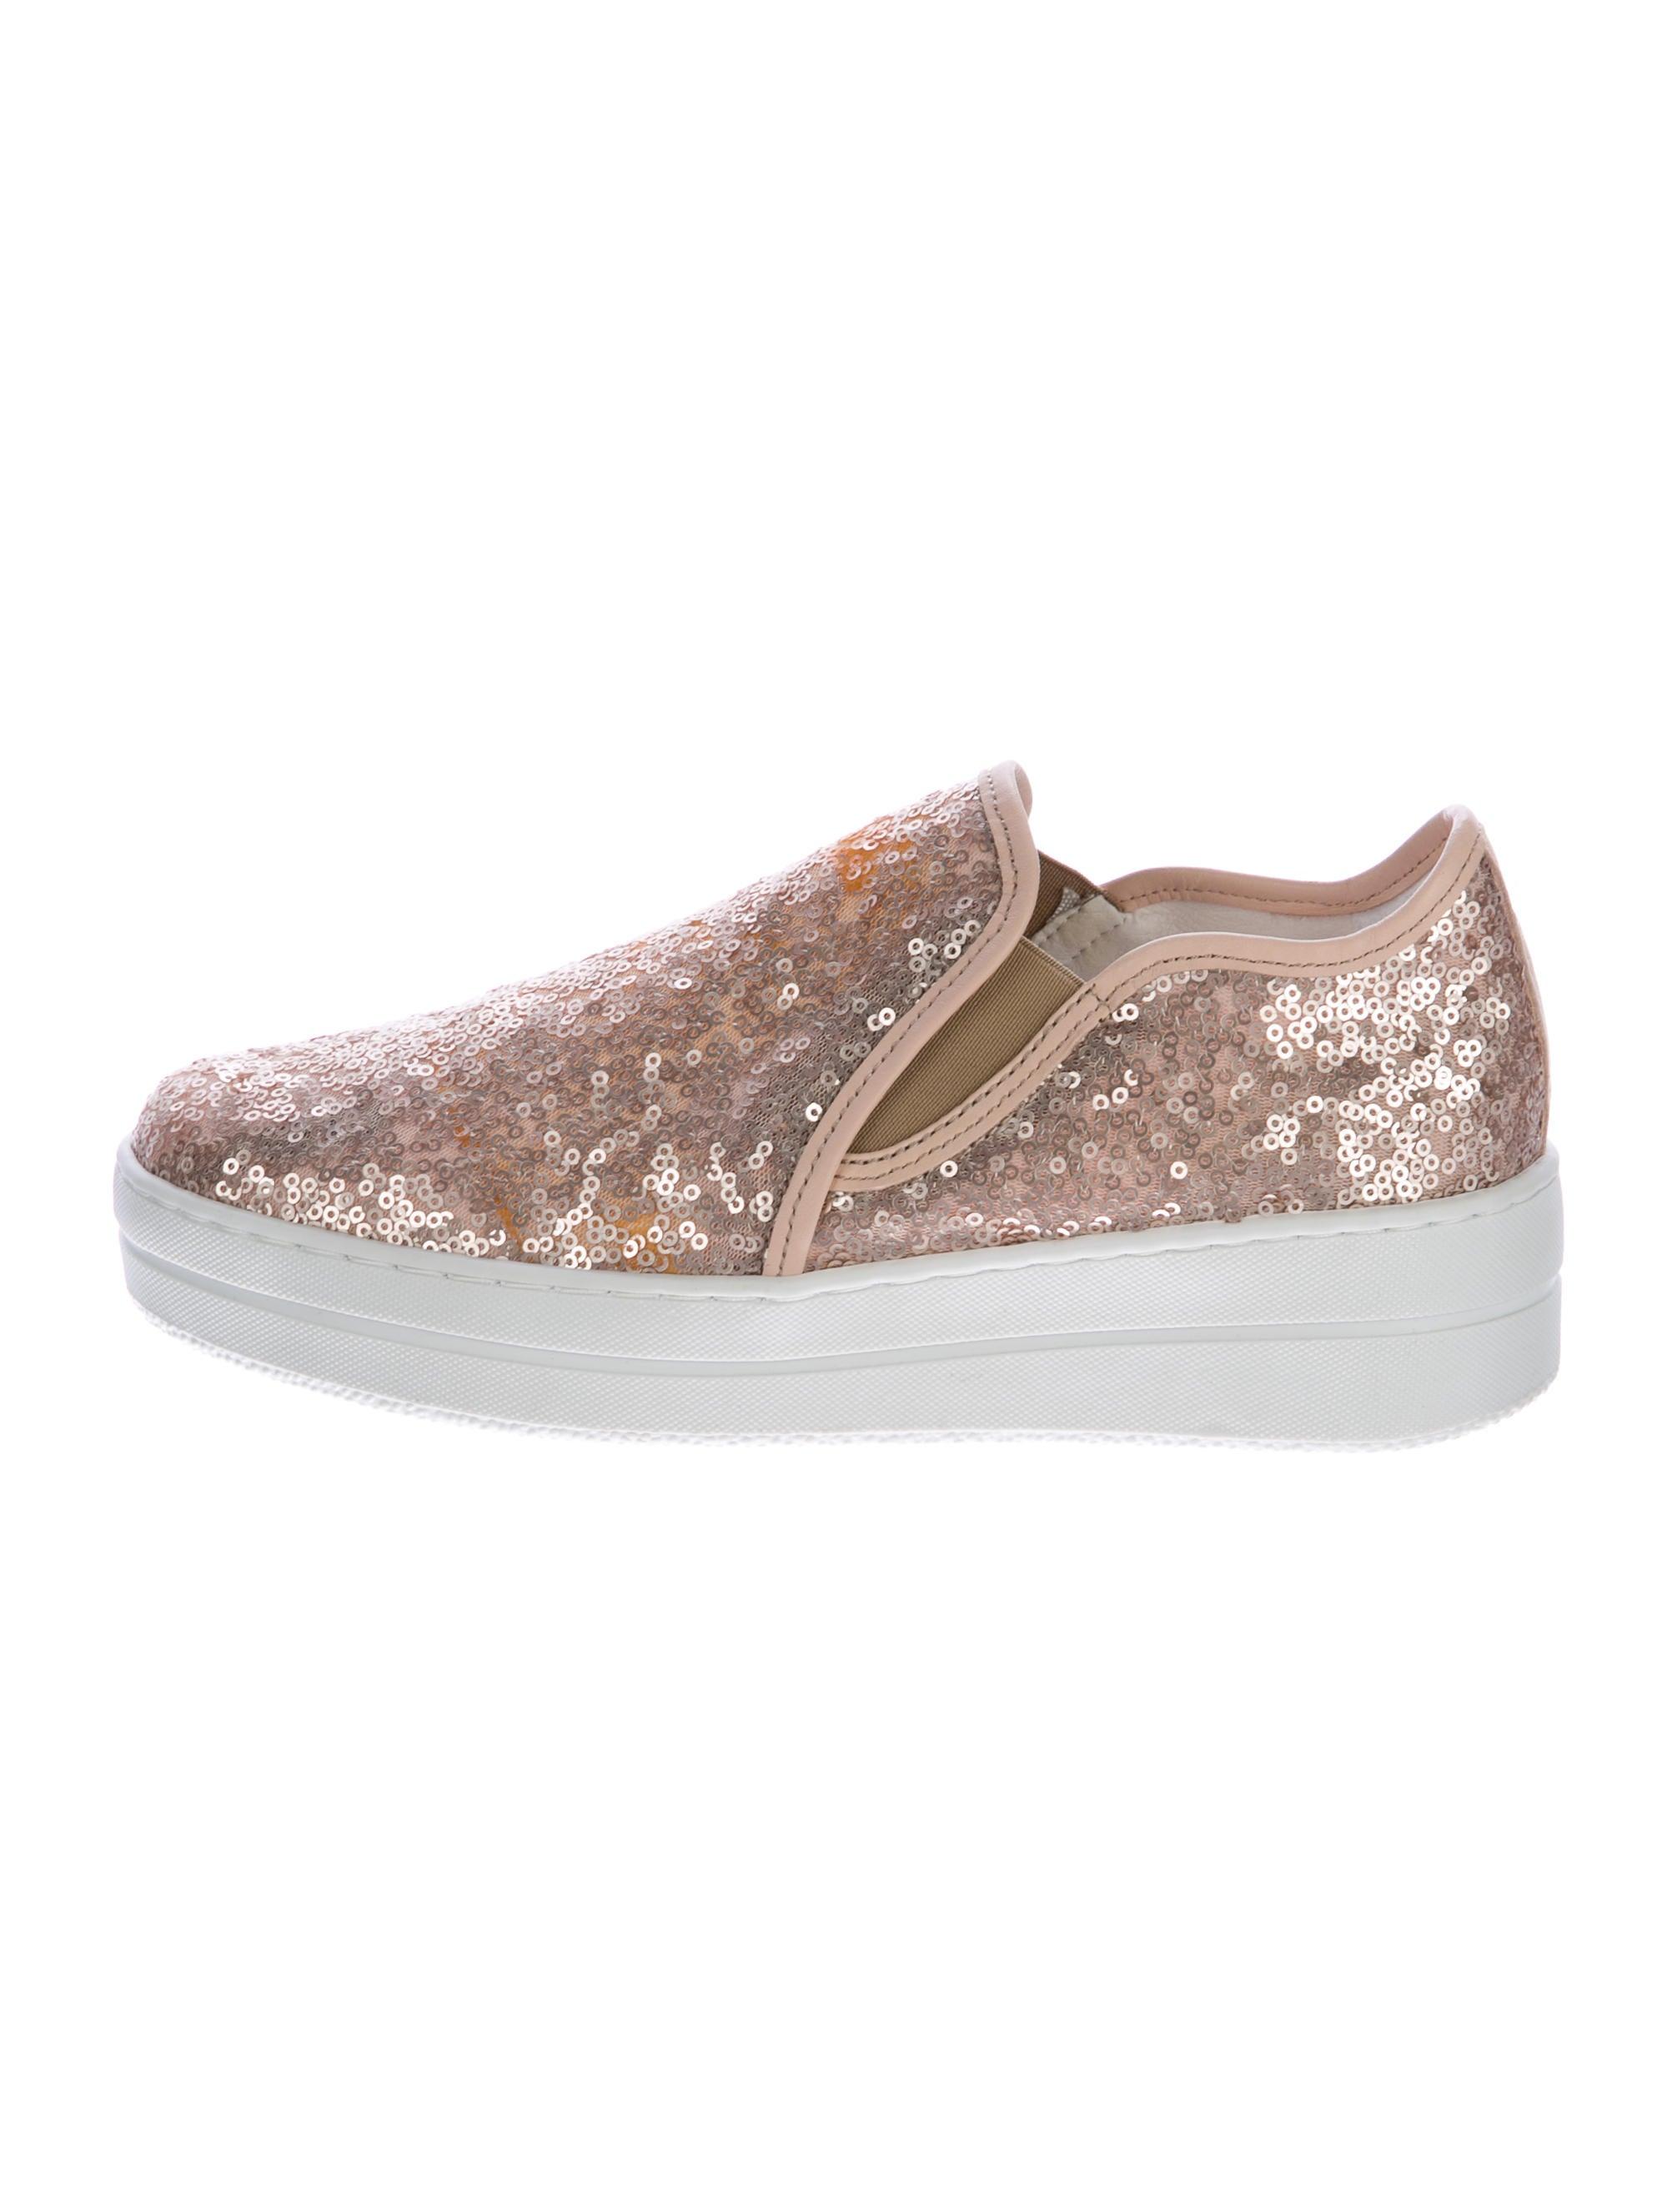 kurt geiger sequin platform slip on sneakers shoes